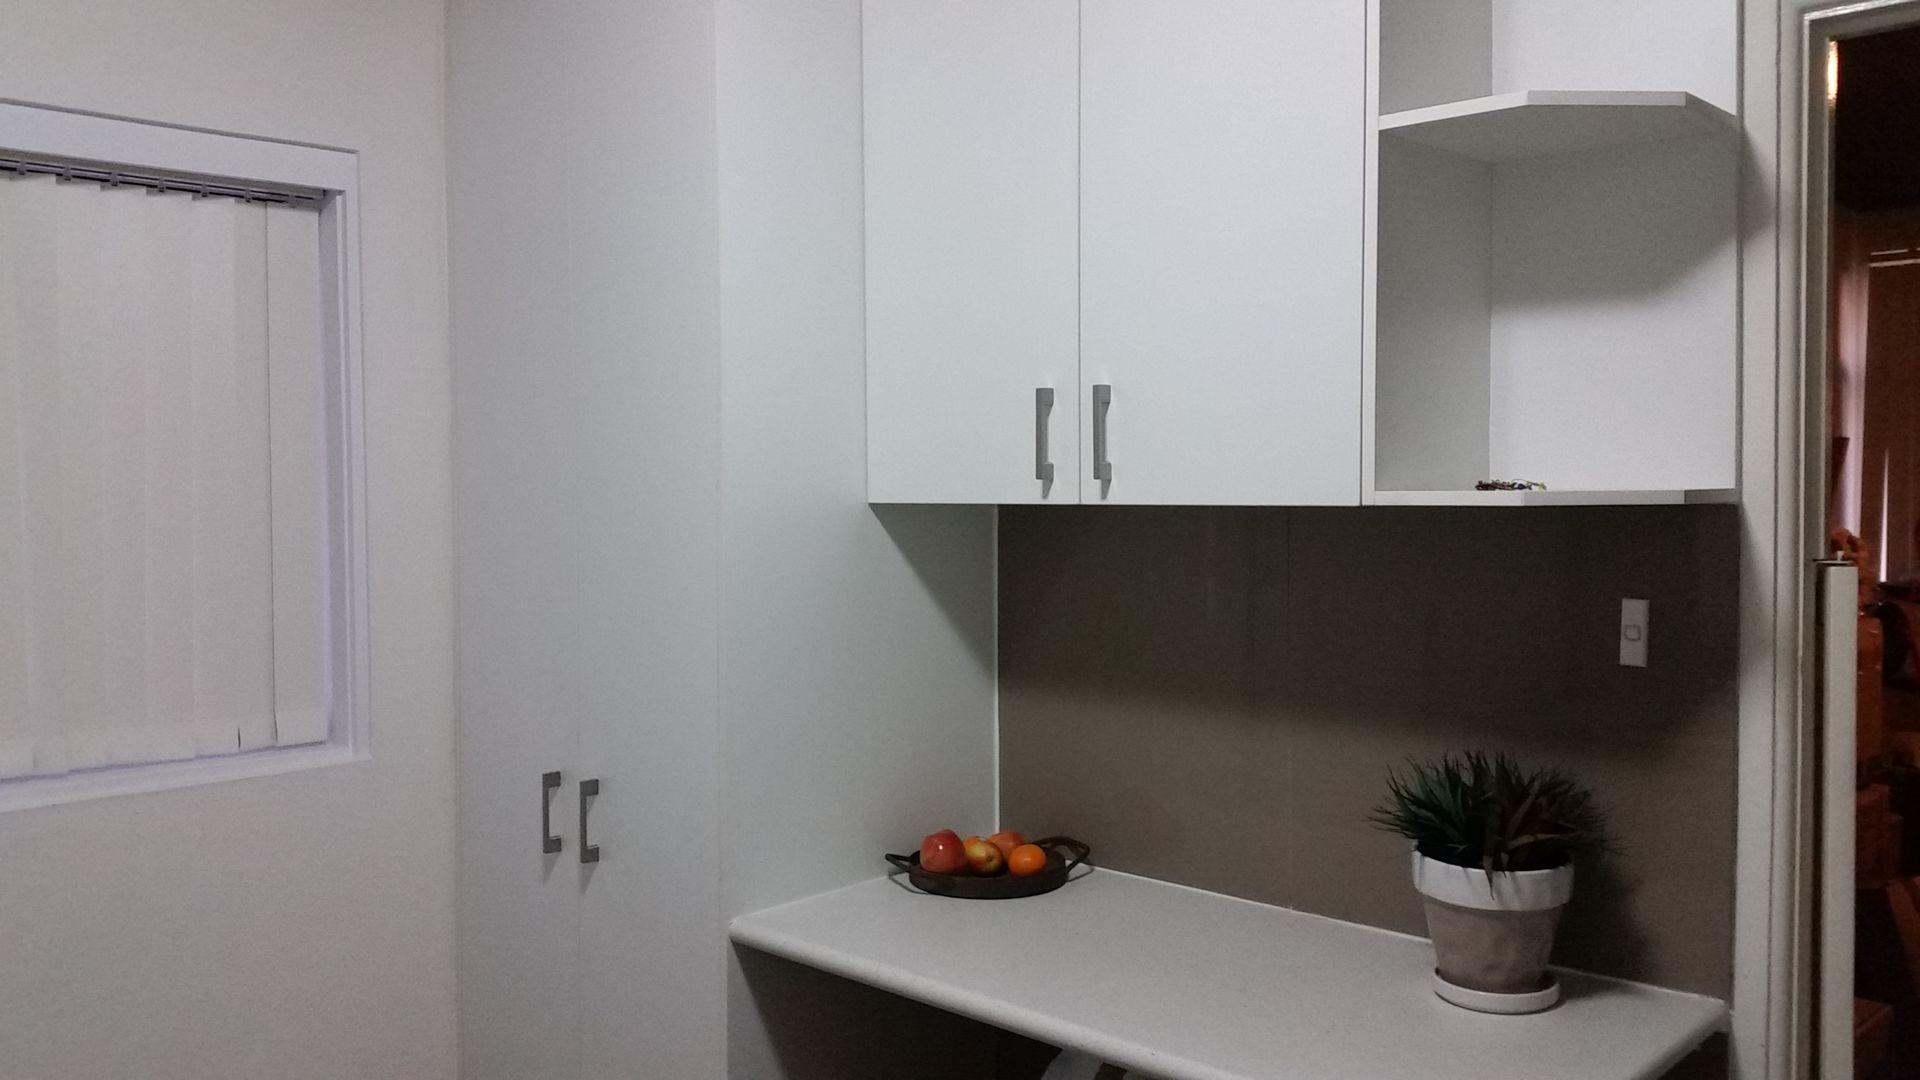 21/132 Wallis Avenue, Strathfield NSW 2135, Image 1